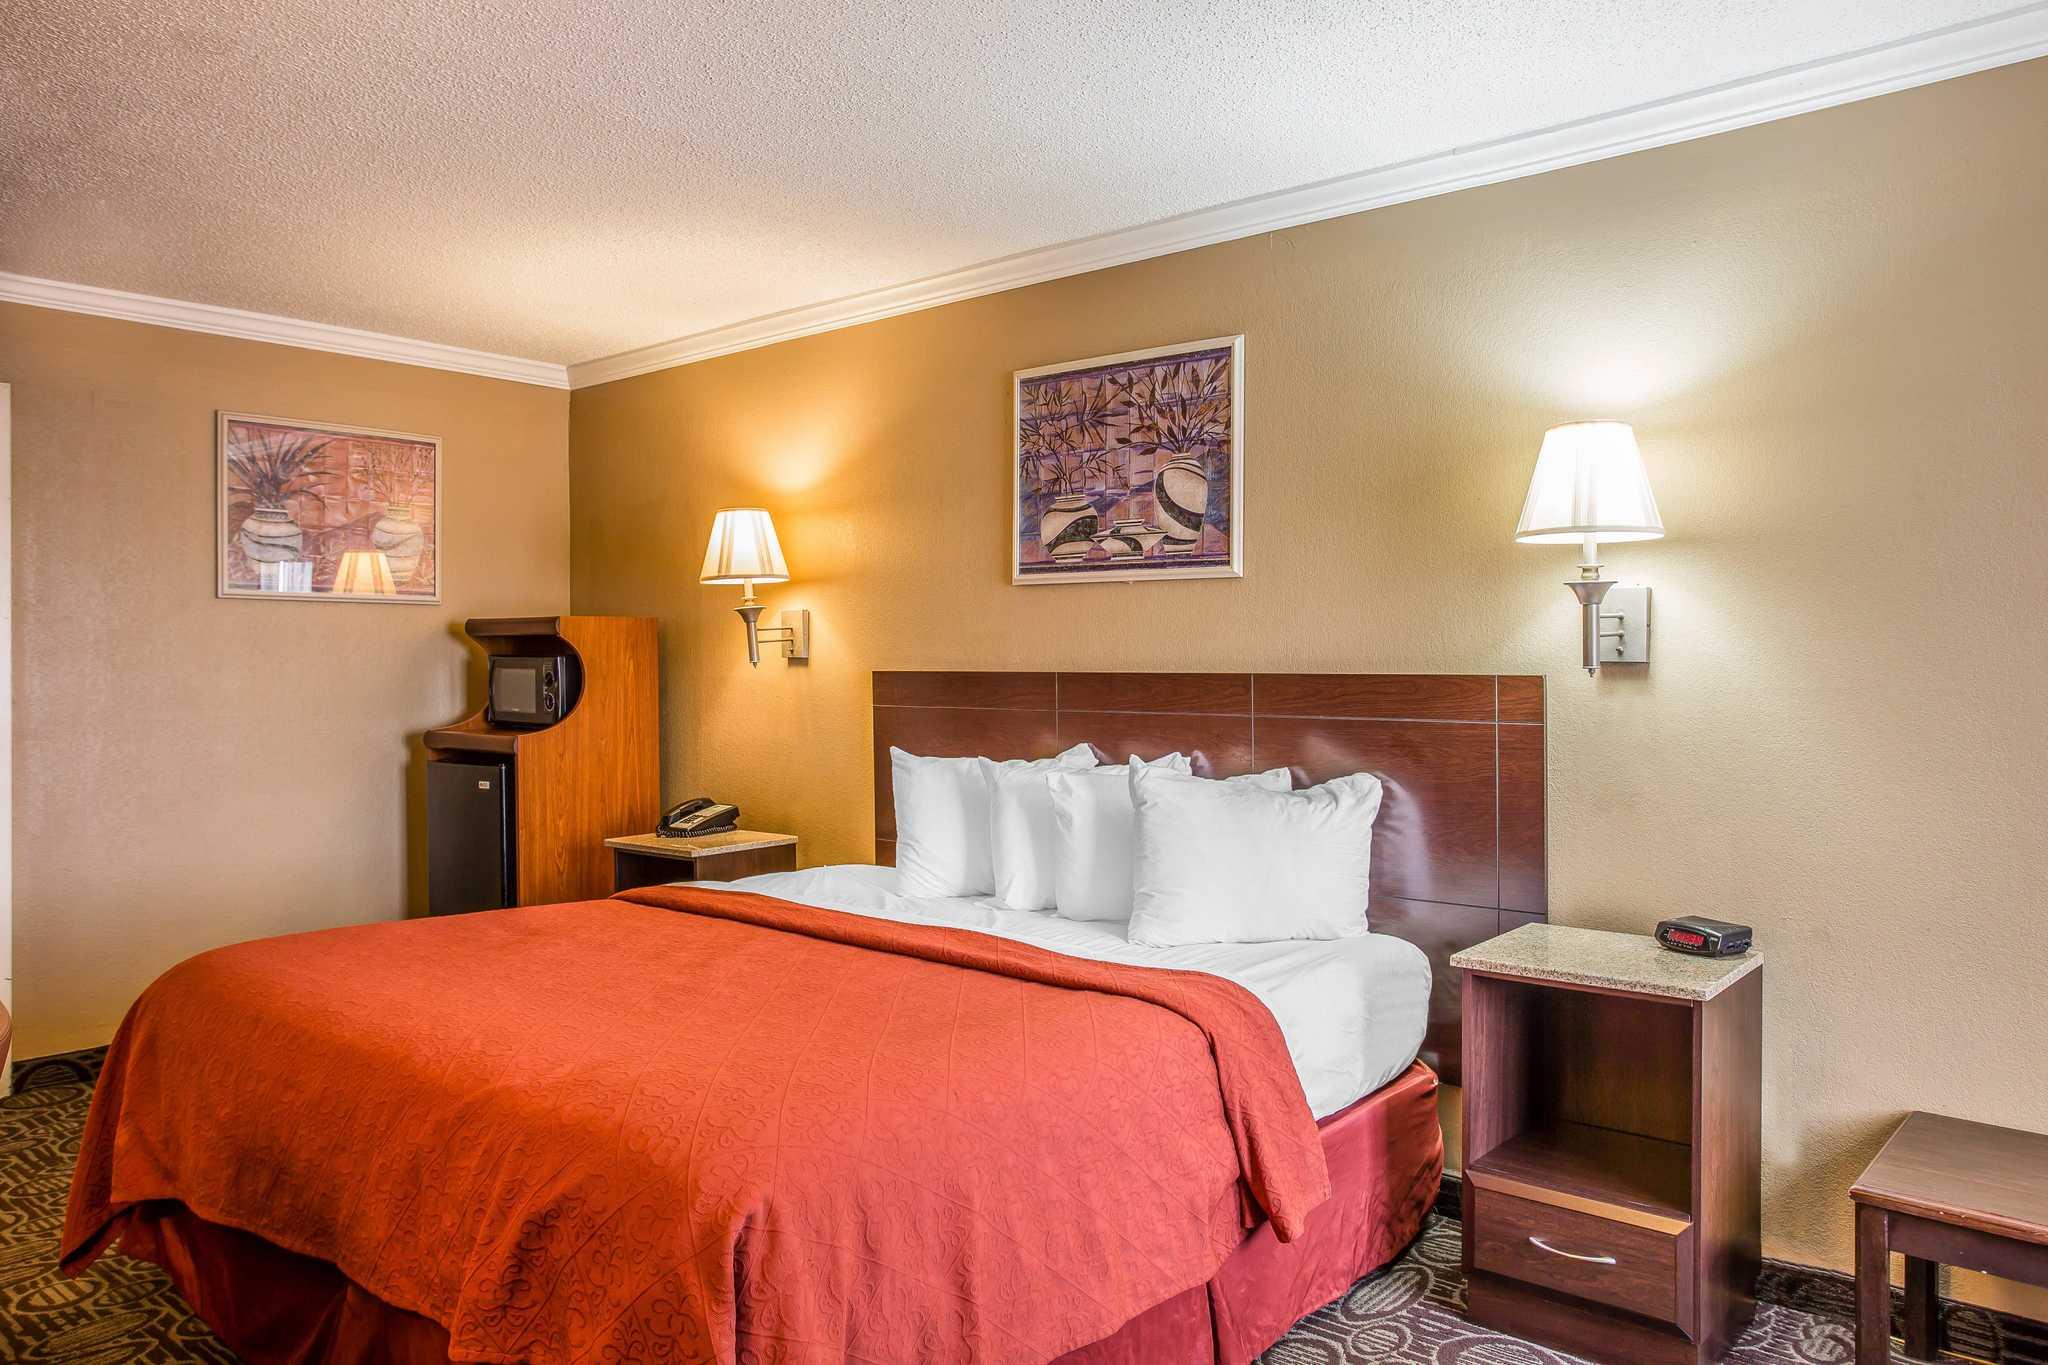 Quality Inn & Suites Ft. Jackson Maingate image 17